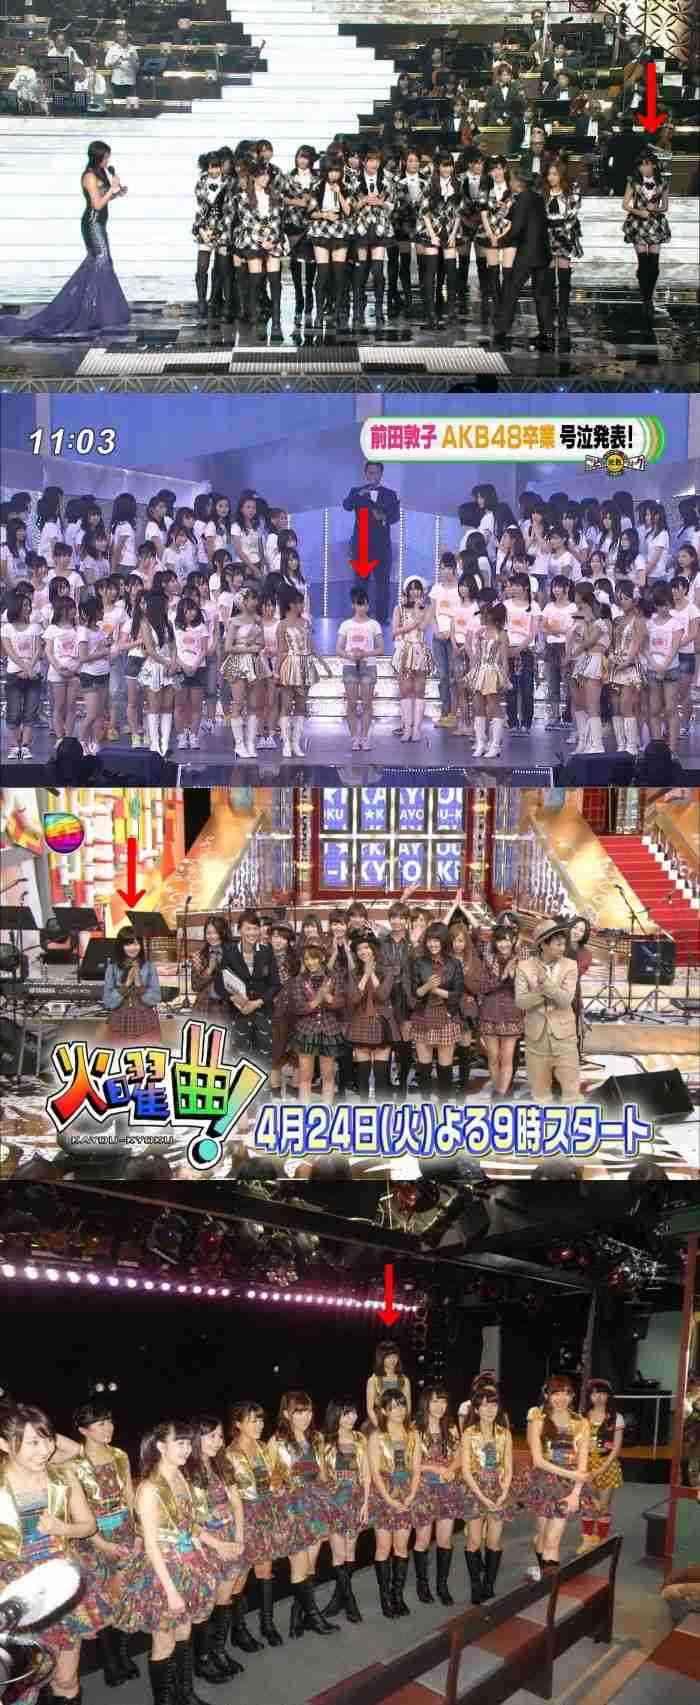 AKB48の島崎遥香がグループを卒業「バイバイ、AKB48!」